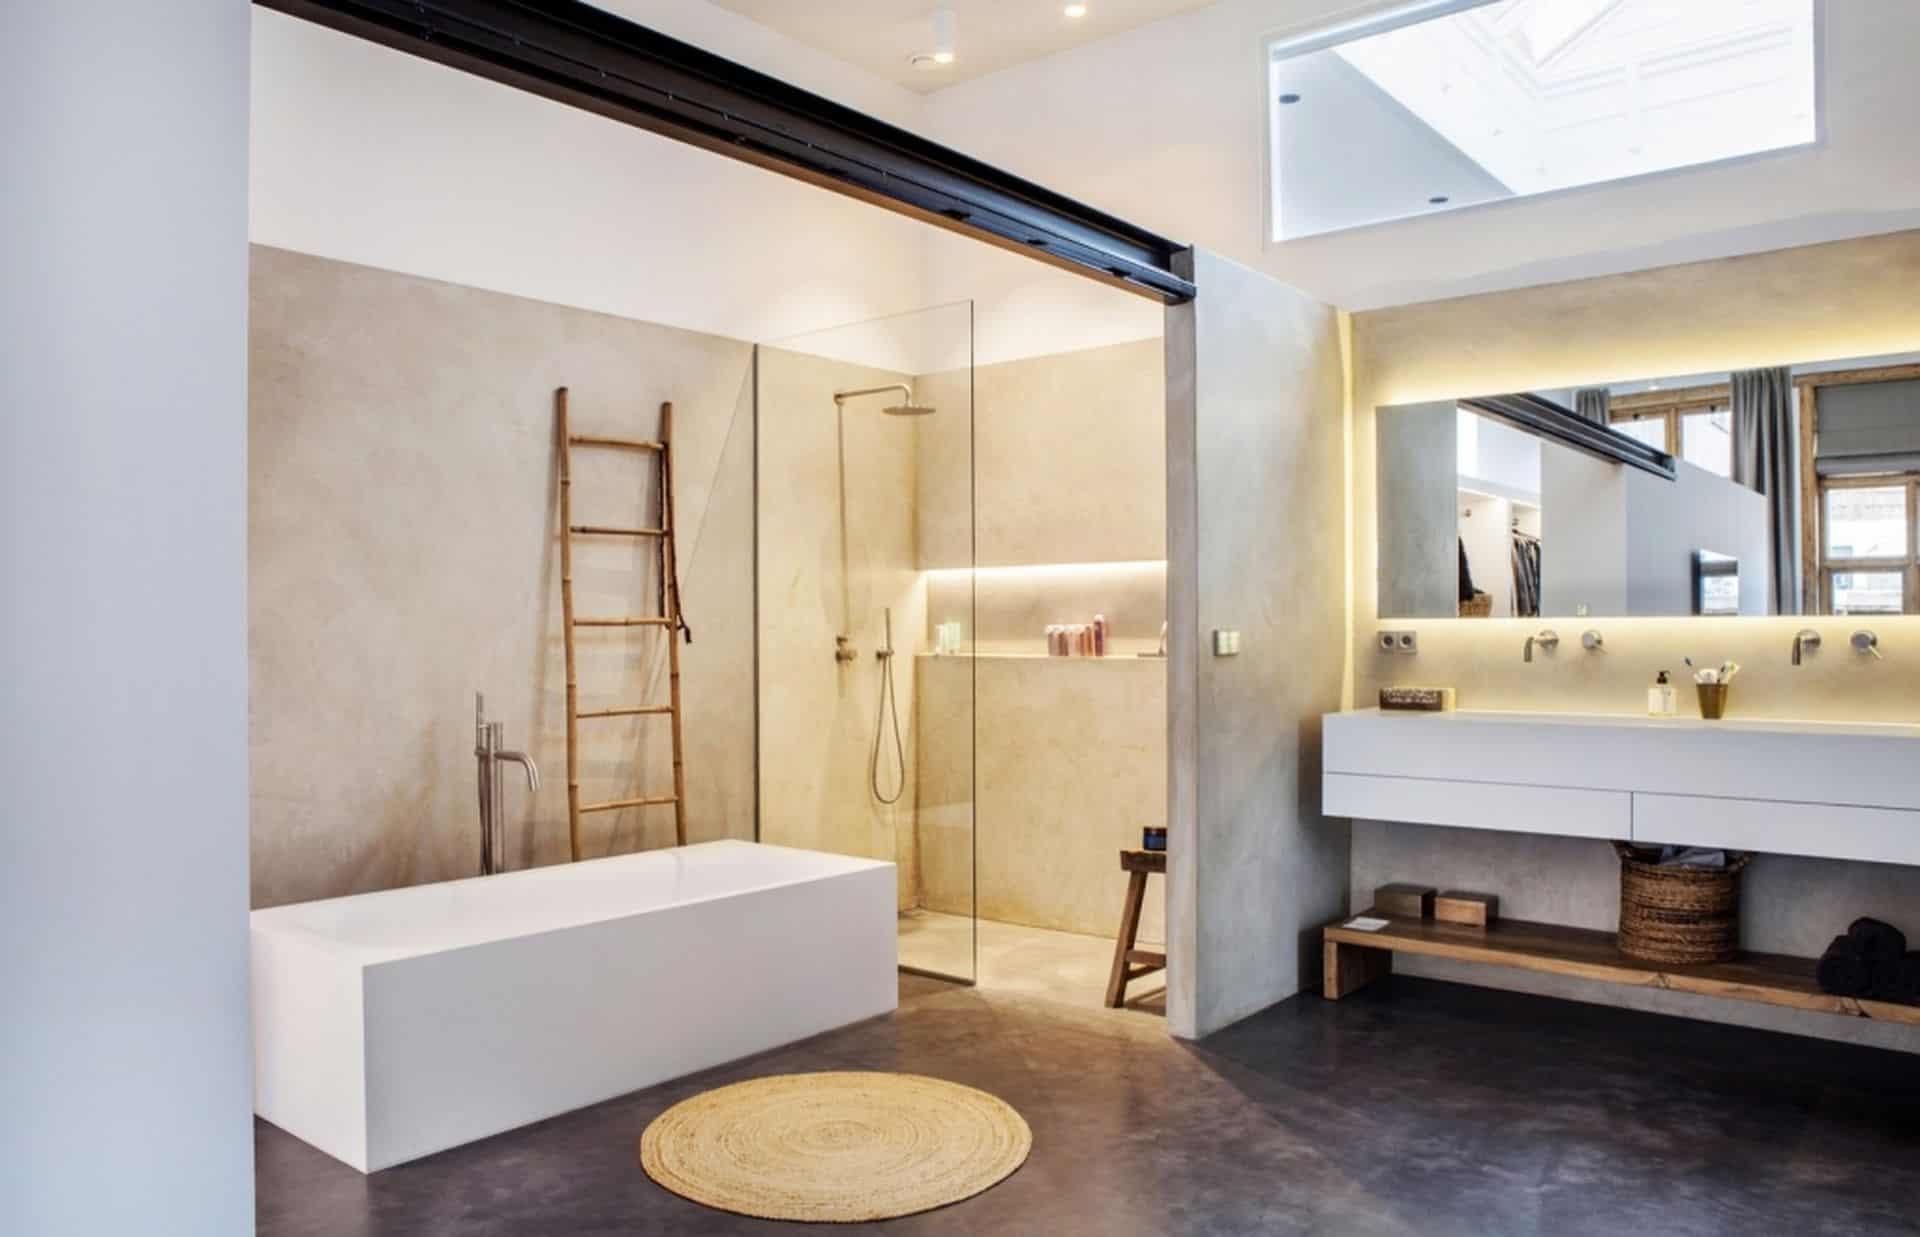 betonvloer in omgebouwde school, badkamer